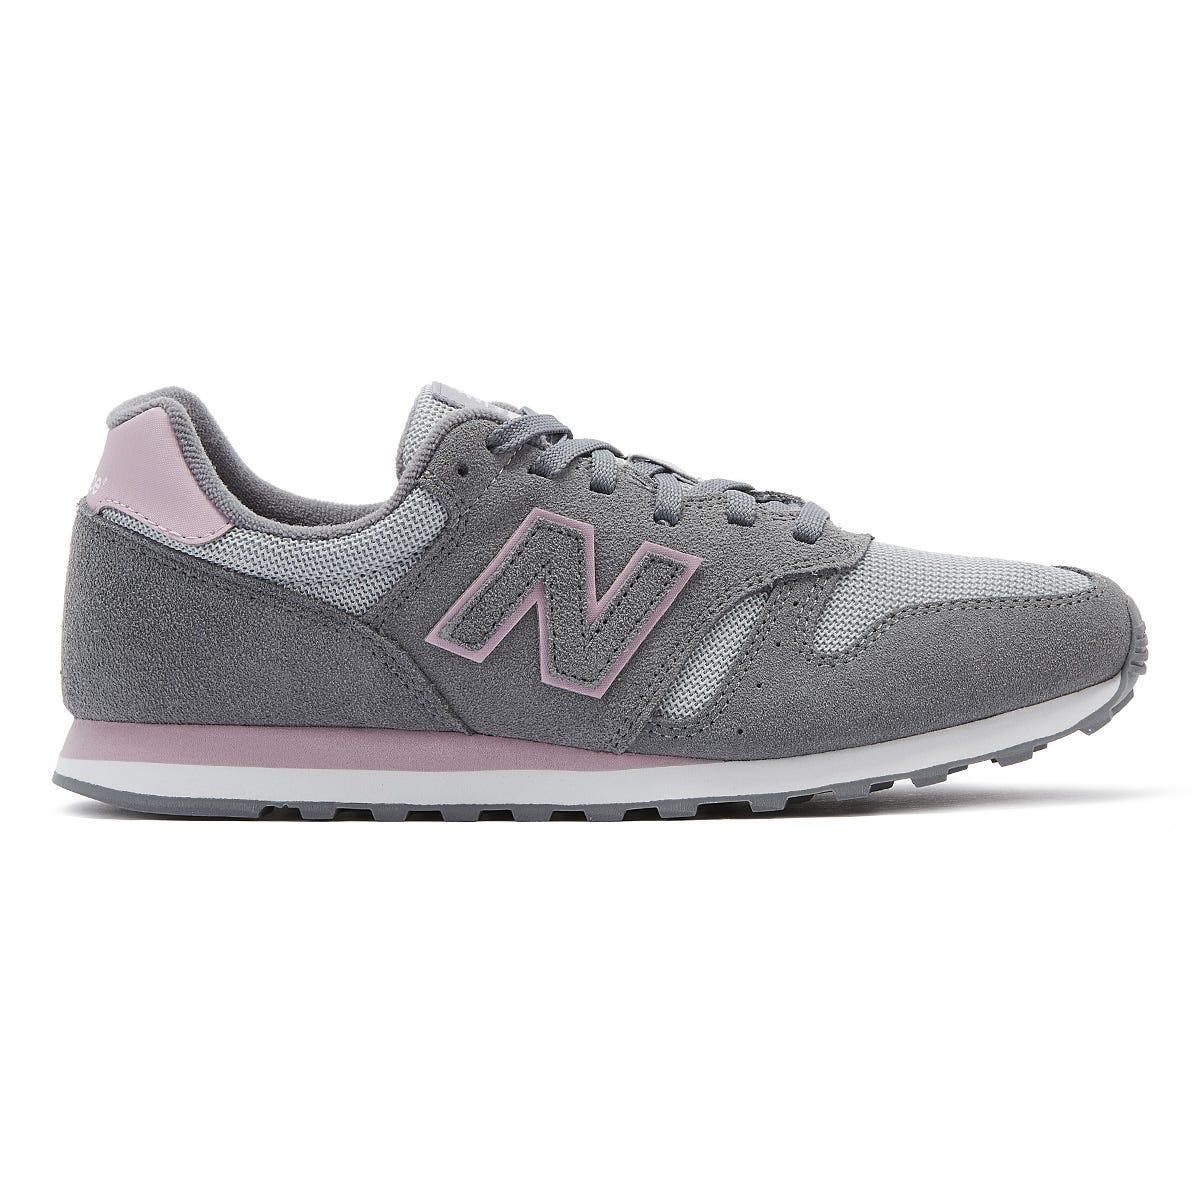 New Balance Suede 373 Womens Grey